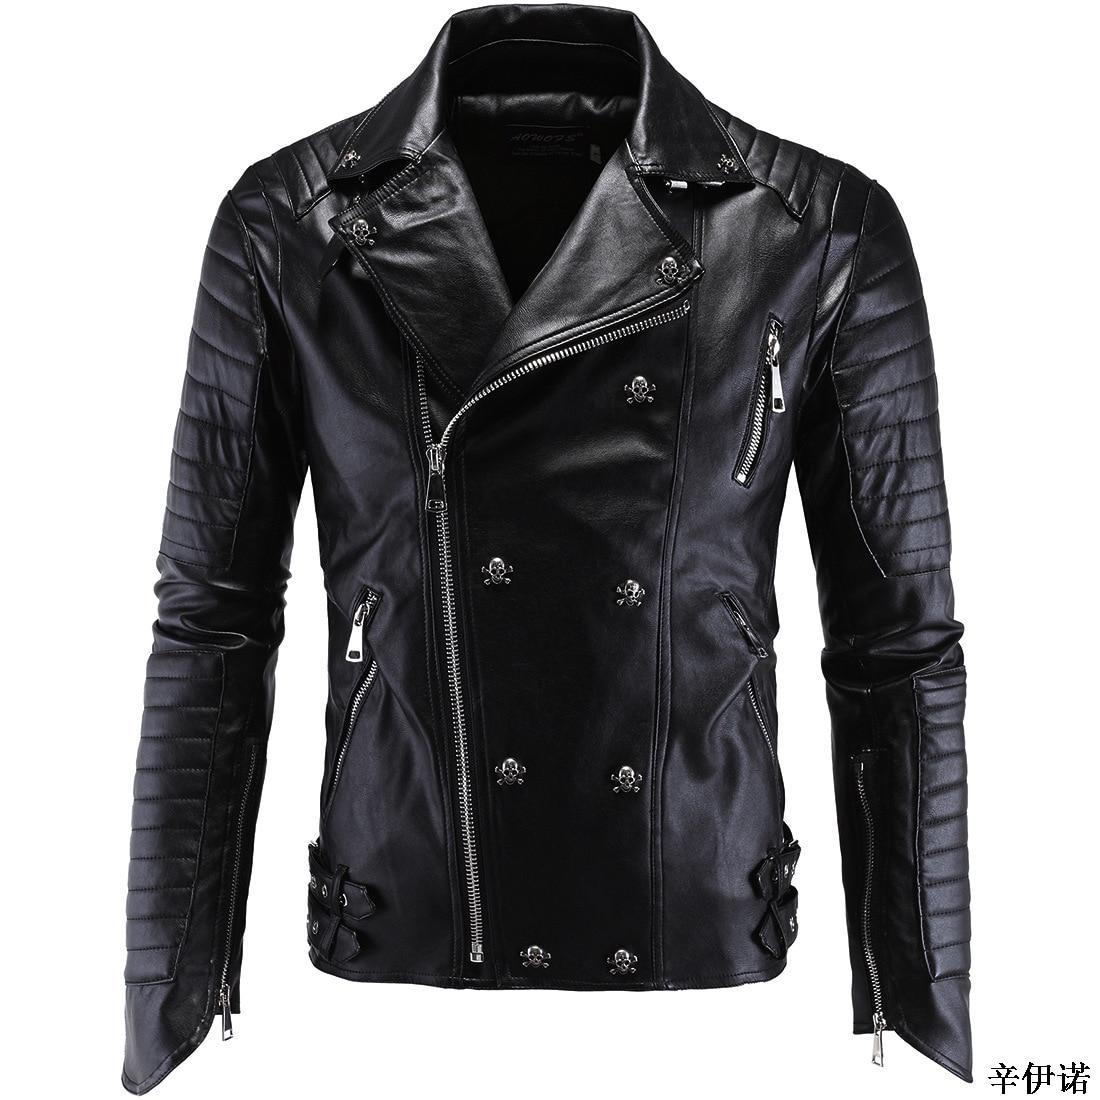 Plus size5XL Fashion Brand Men's Winter Leather Jackets Faux Jacket Korean Style Slim Harley Coats Men Moto Skull Jacket For Men